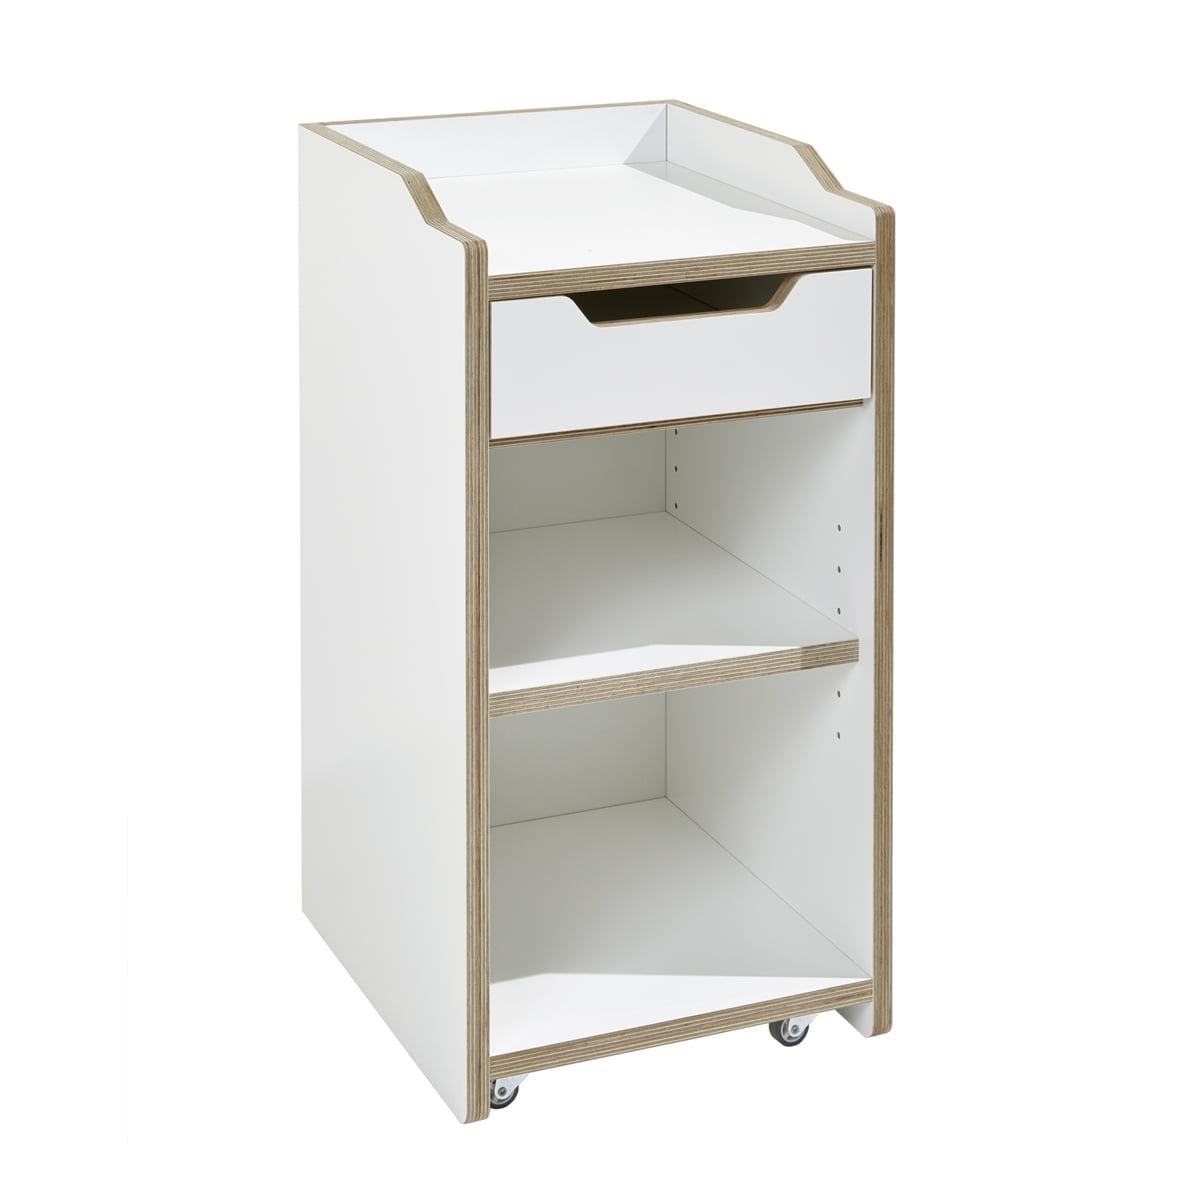 Müller Möbelwerkstätten - Plane Container, weiß (ohne Tür) | Büro > Büroschränke | Weiß | Birkenschichtholz -  weiß beschichtet -  kante geölt | Müller Möbelwerkstätten